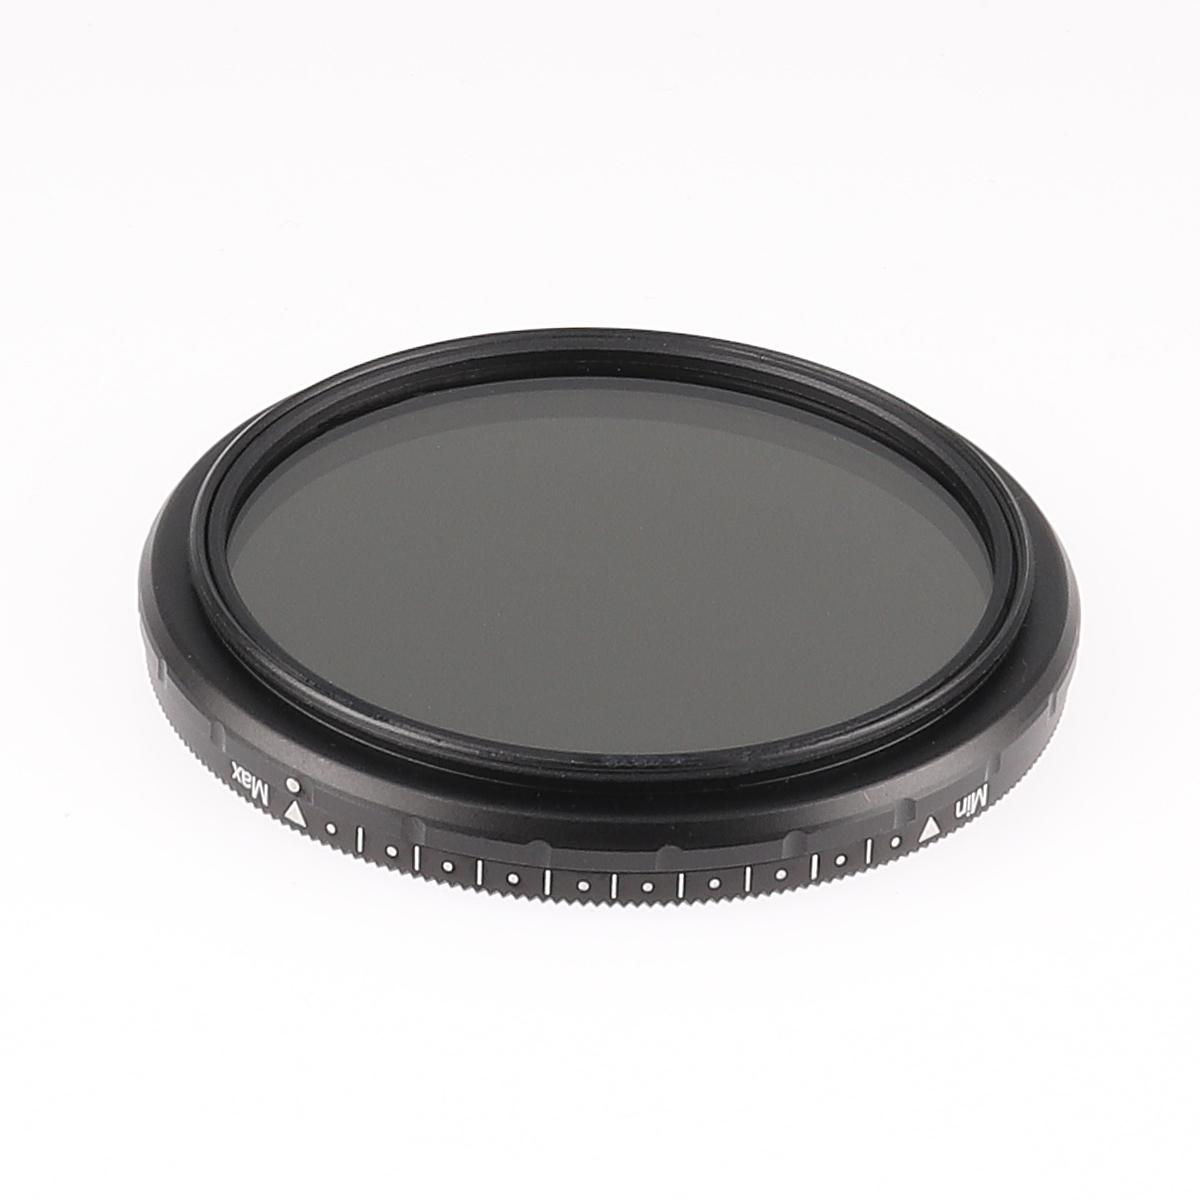 Fotga Ultra Slim Hd Fader Variable Adjustable Nd2 To Nd400 Neutral Density Nd Filter With Stops 55mm Fotga Official Website